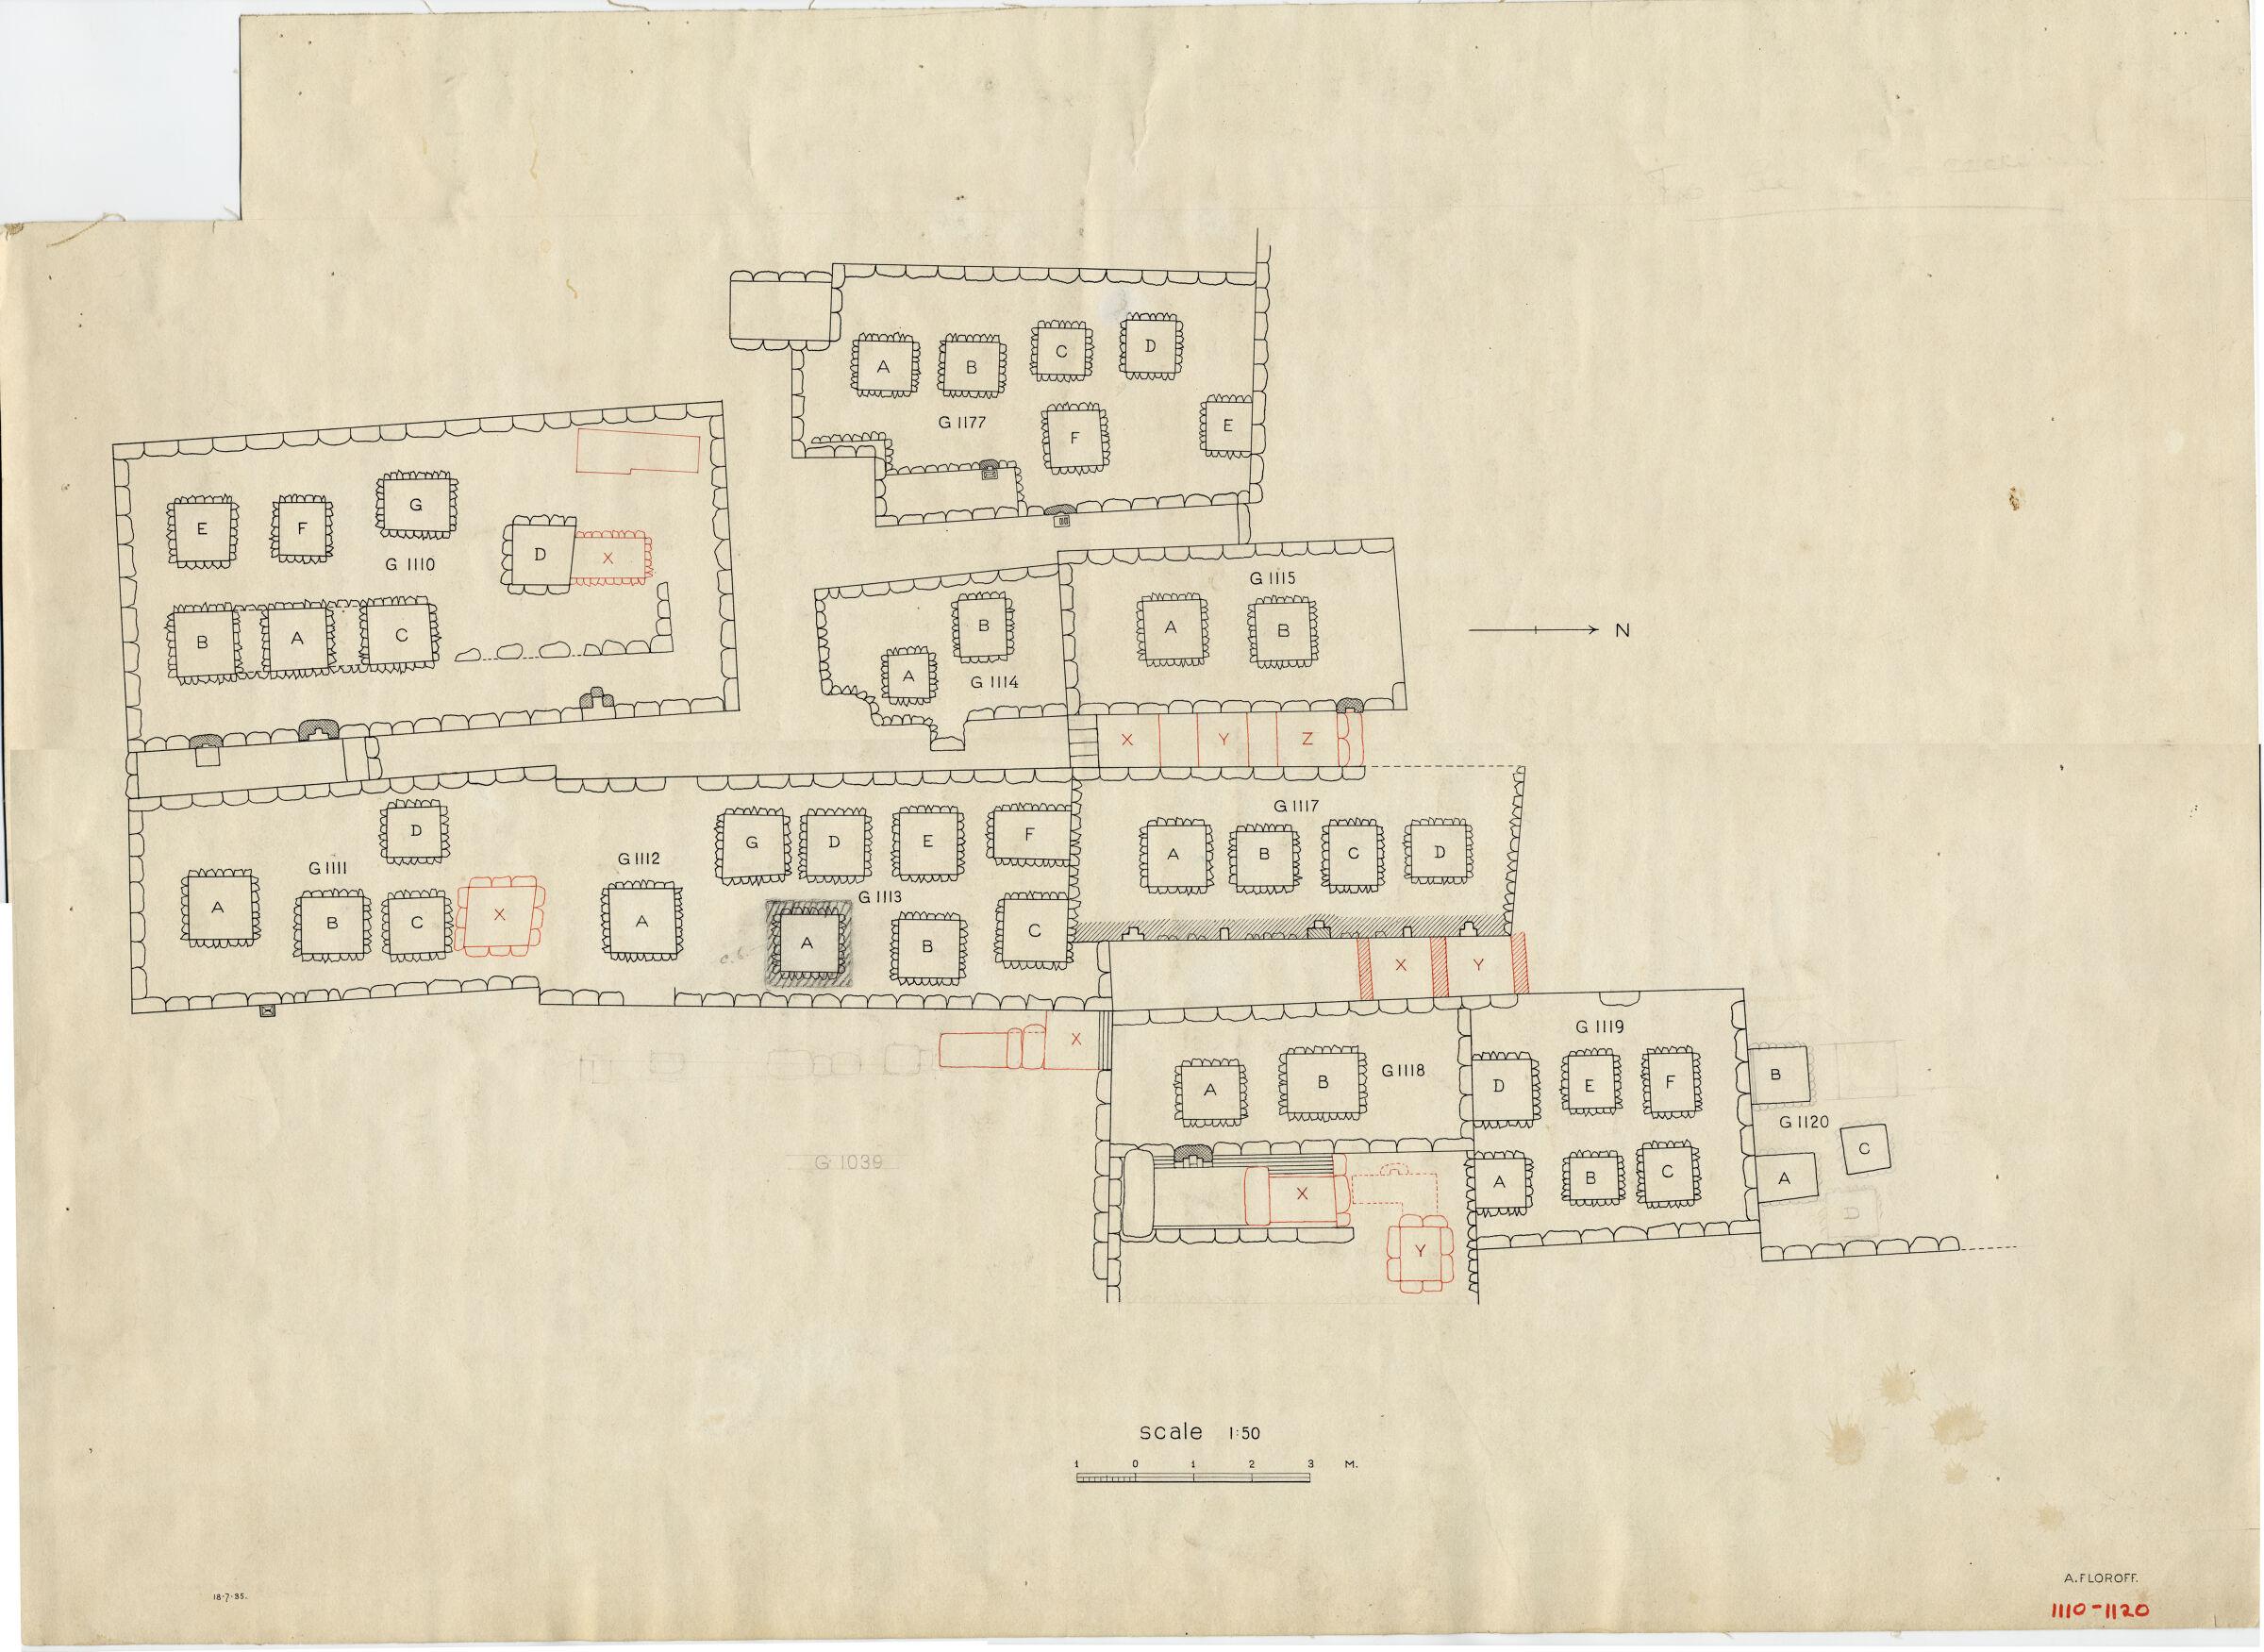 Maps and plans: Plan of G 1039, G 1110, G 1111, G 1112+1113, G 1114, G 1115, G 1117, G 1118, G 1119, G 1120, G 1177